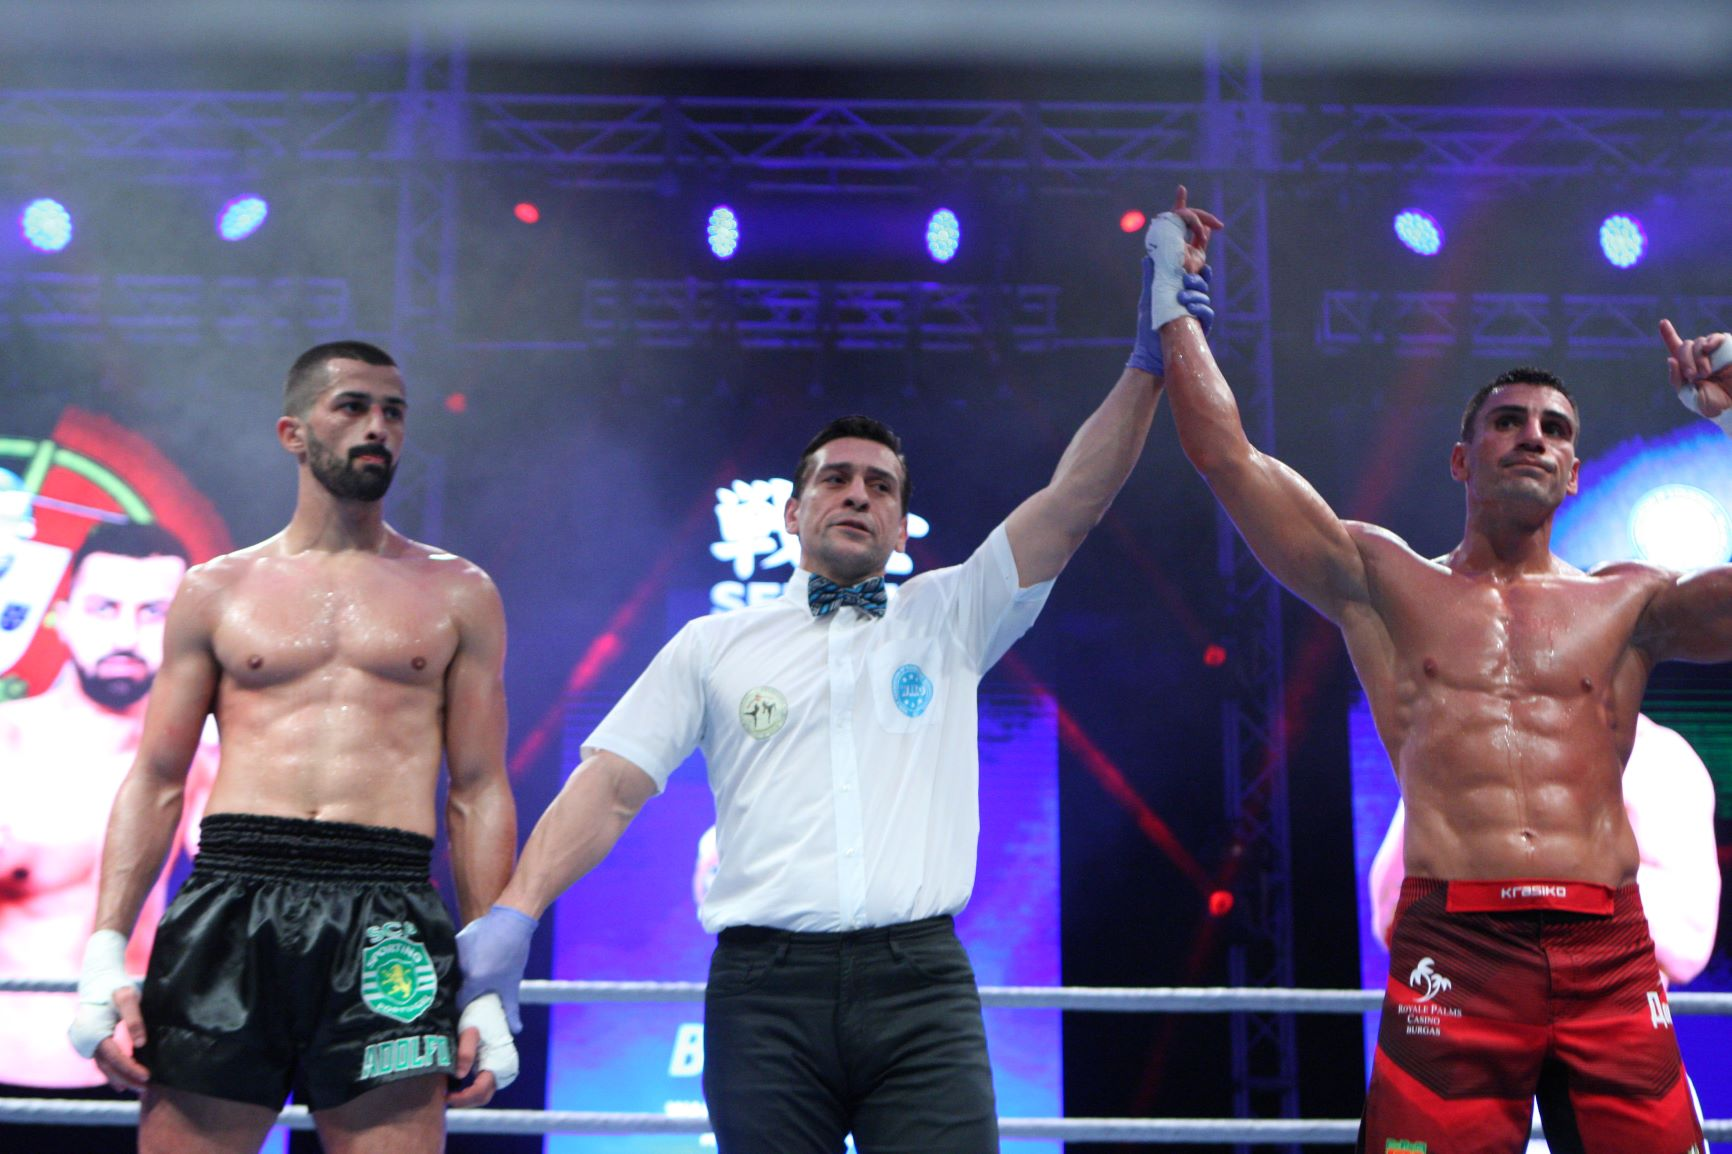 ВИДЕО: Доминантната победа на Атанас Божилов на SENSHI 5